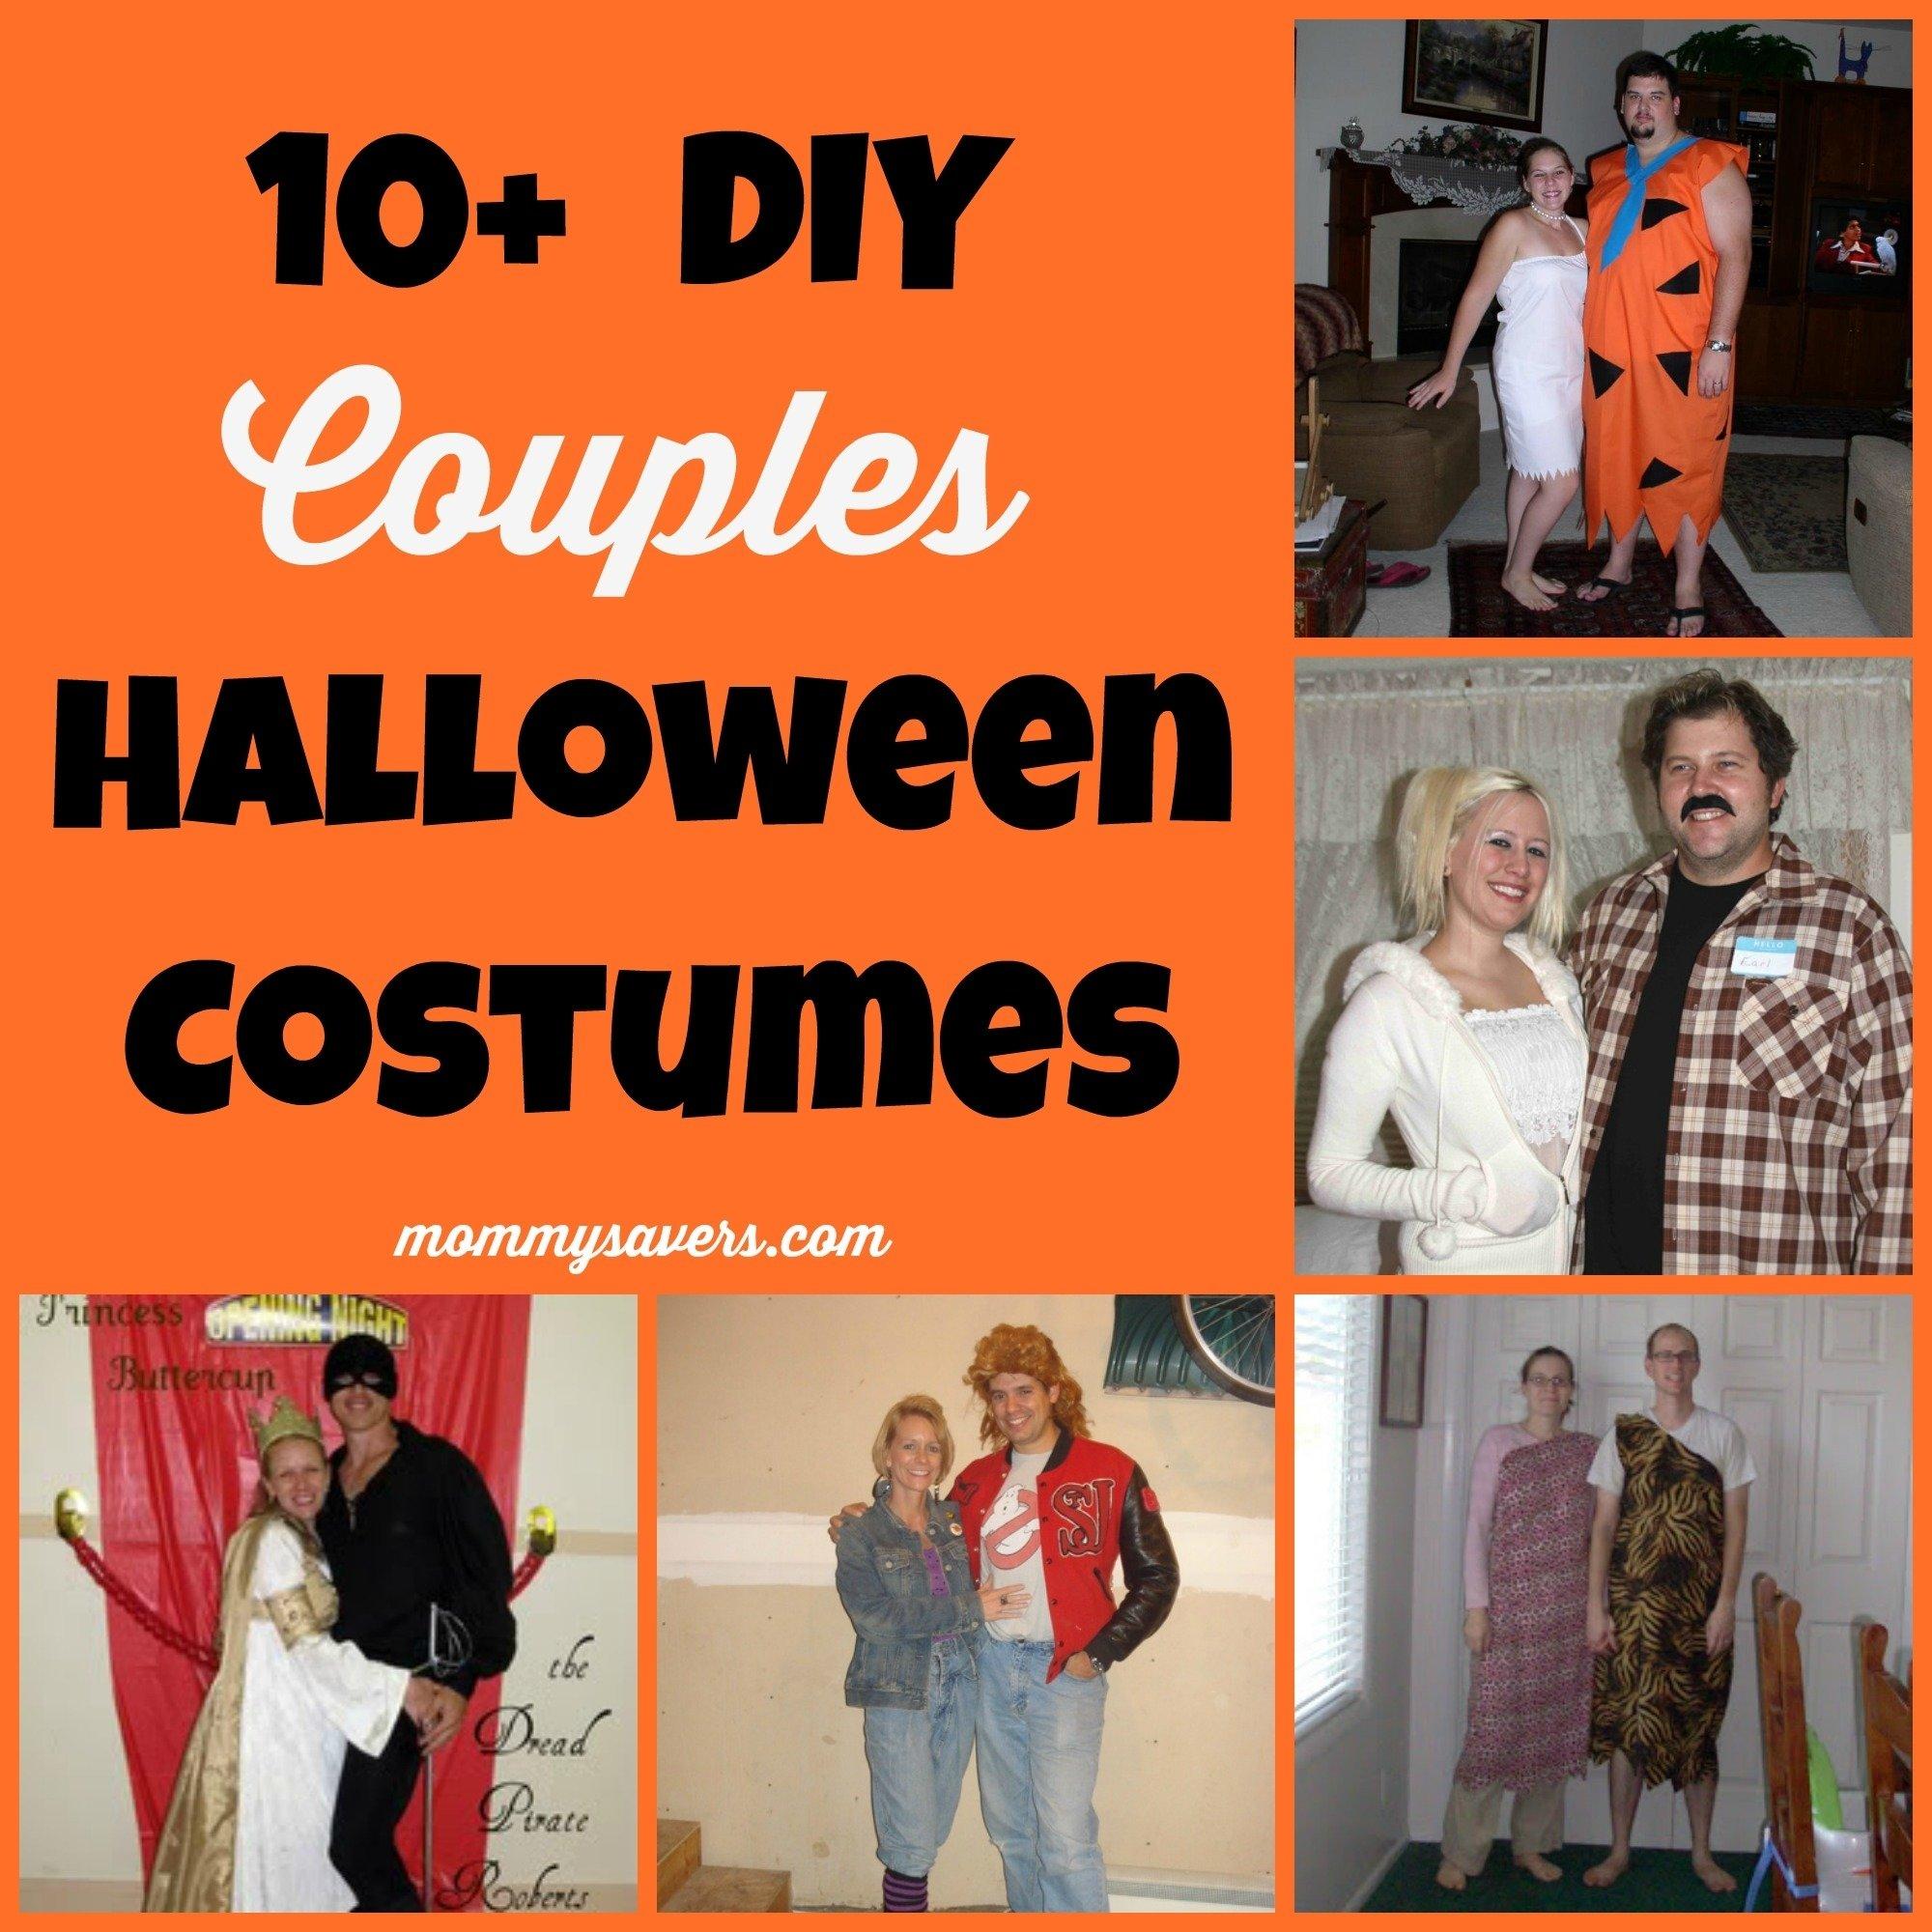 10 Stylish Adult Easy Halloween Costume Ideas 56 easy halloween costumes for adults homemade 62 homemade 2020